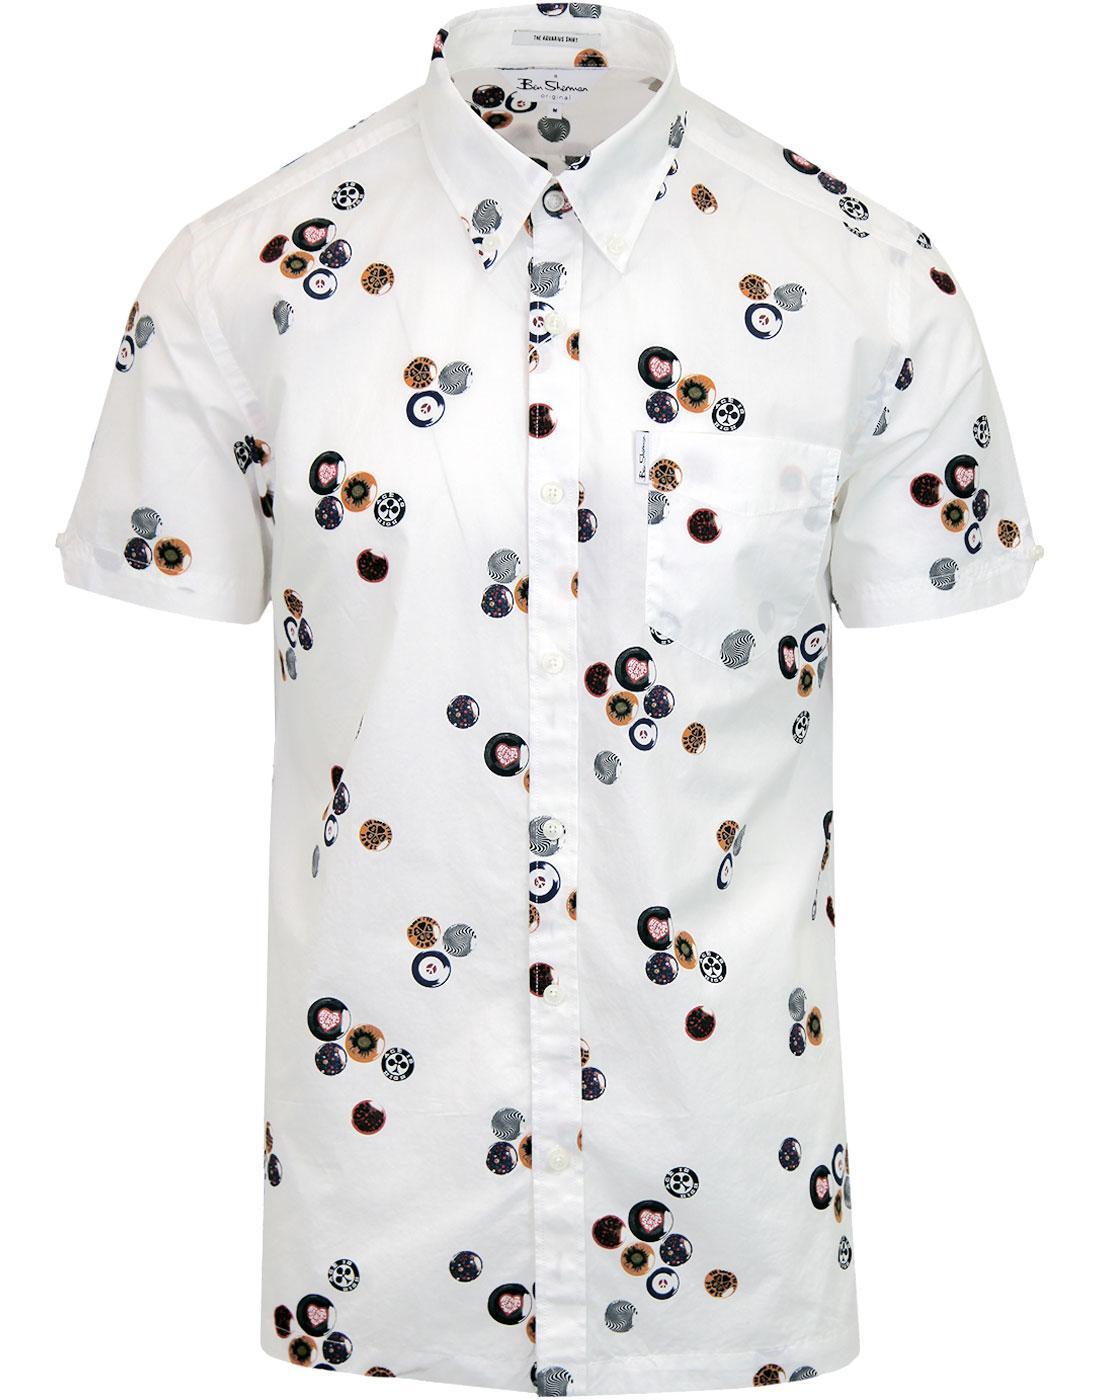 Aquarius BEN SHERMAN Northern Soul Archive Shirt